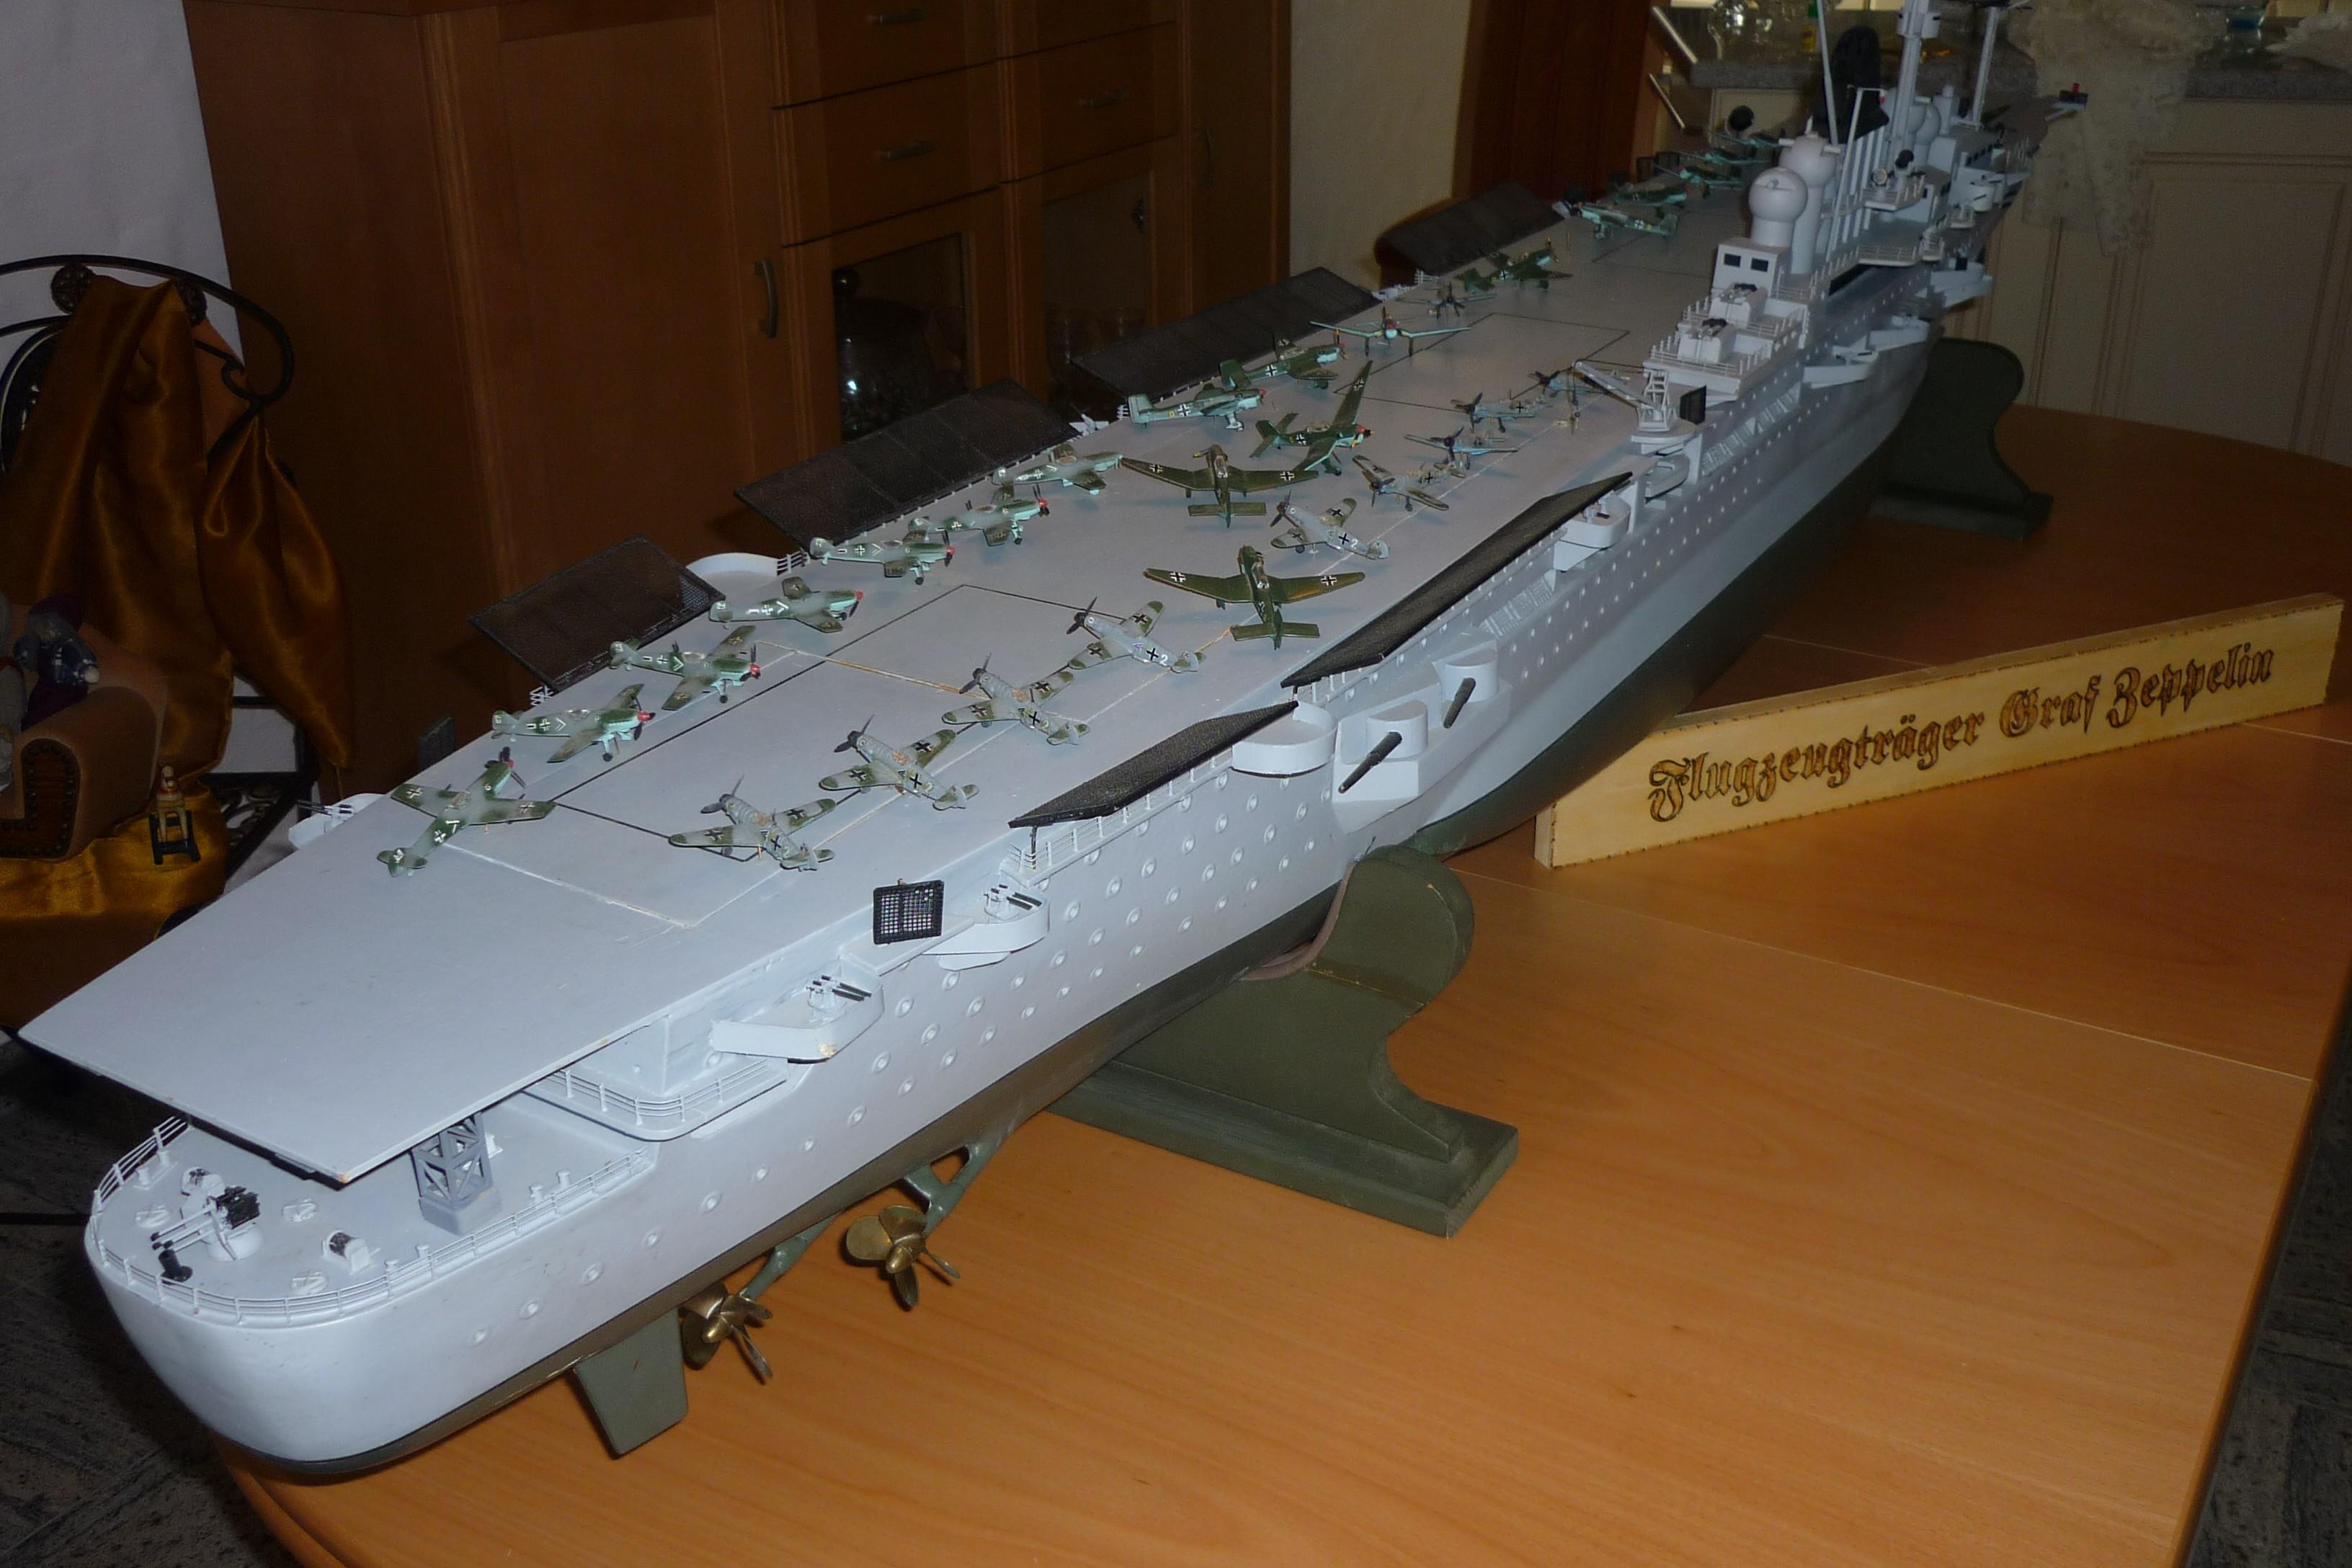 Graue Flotte – Modellwerft-desehe.eu